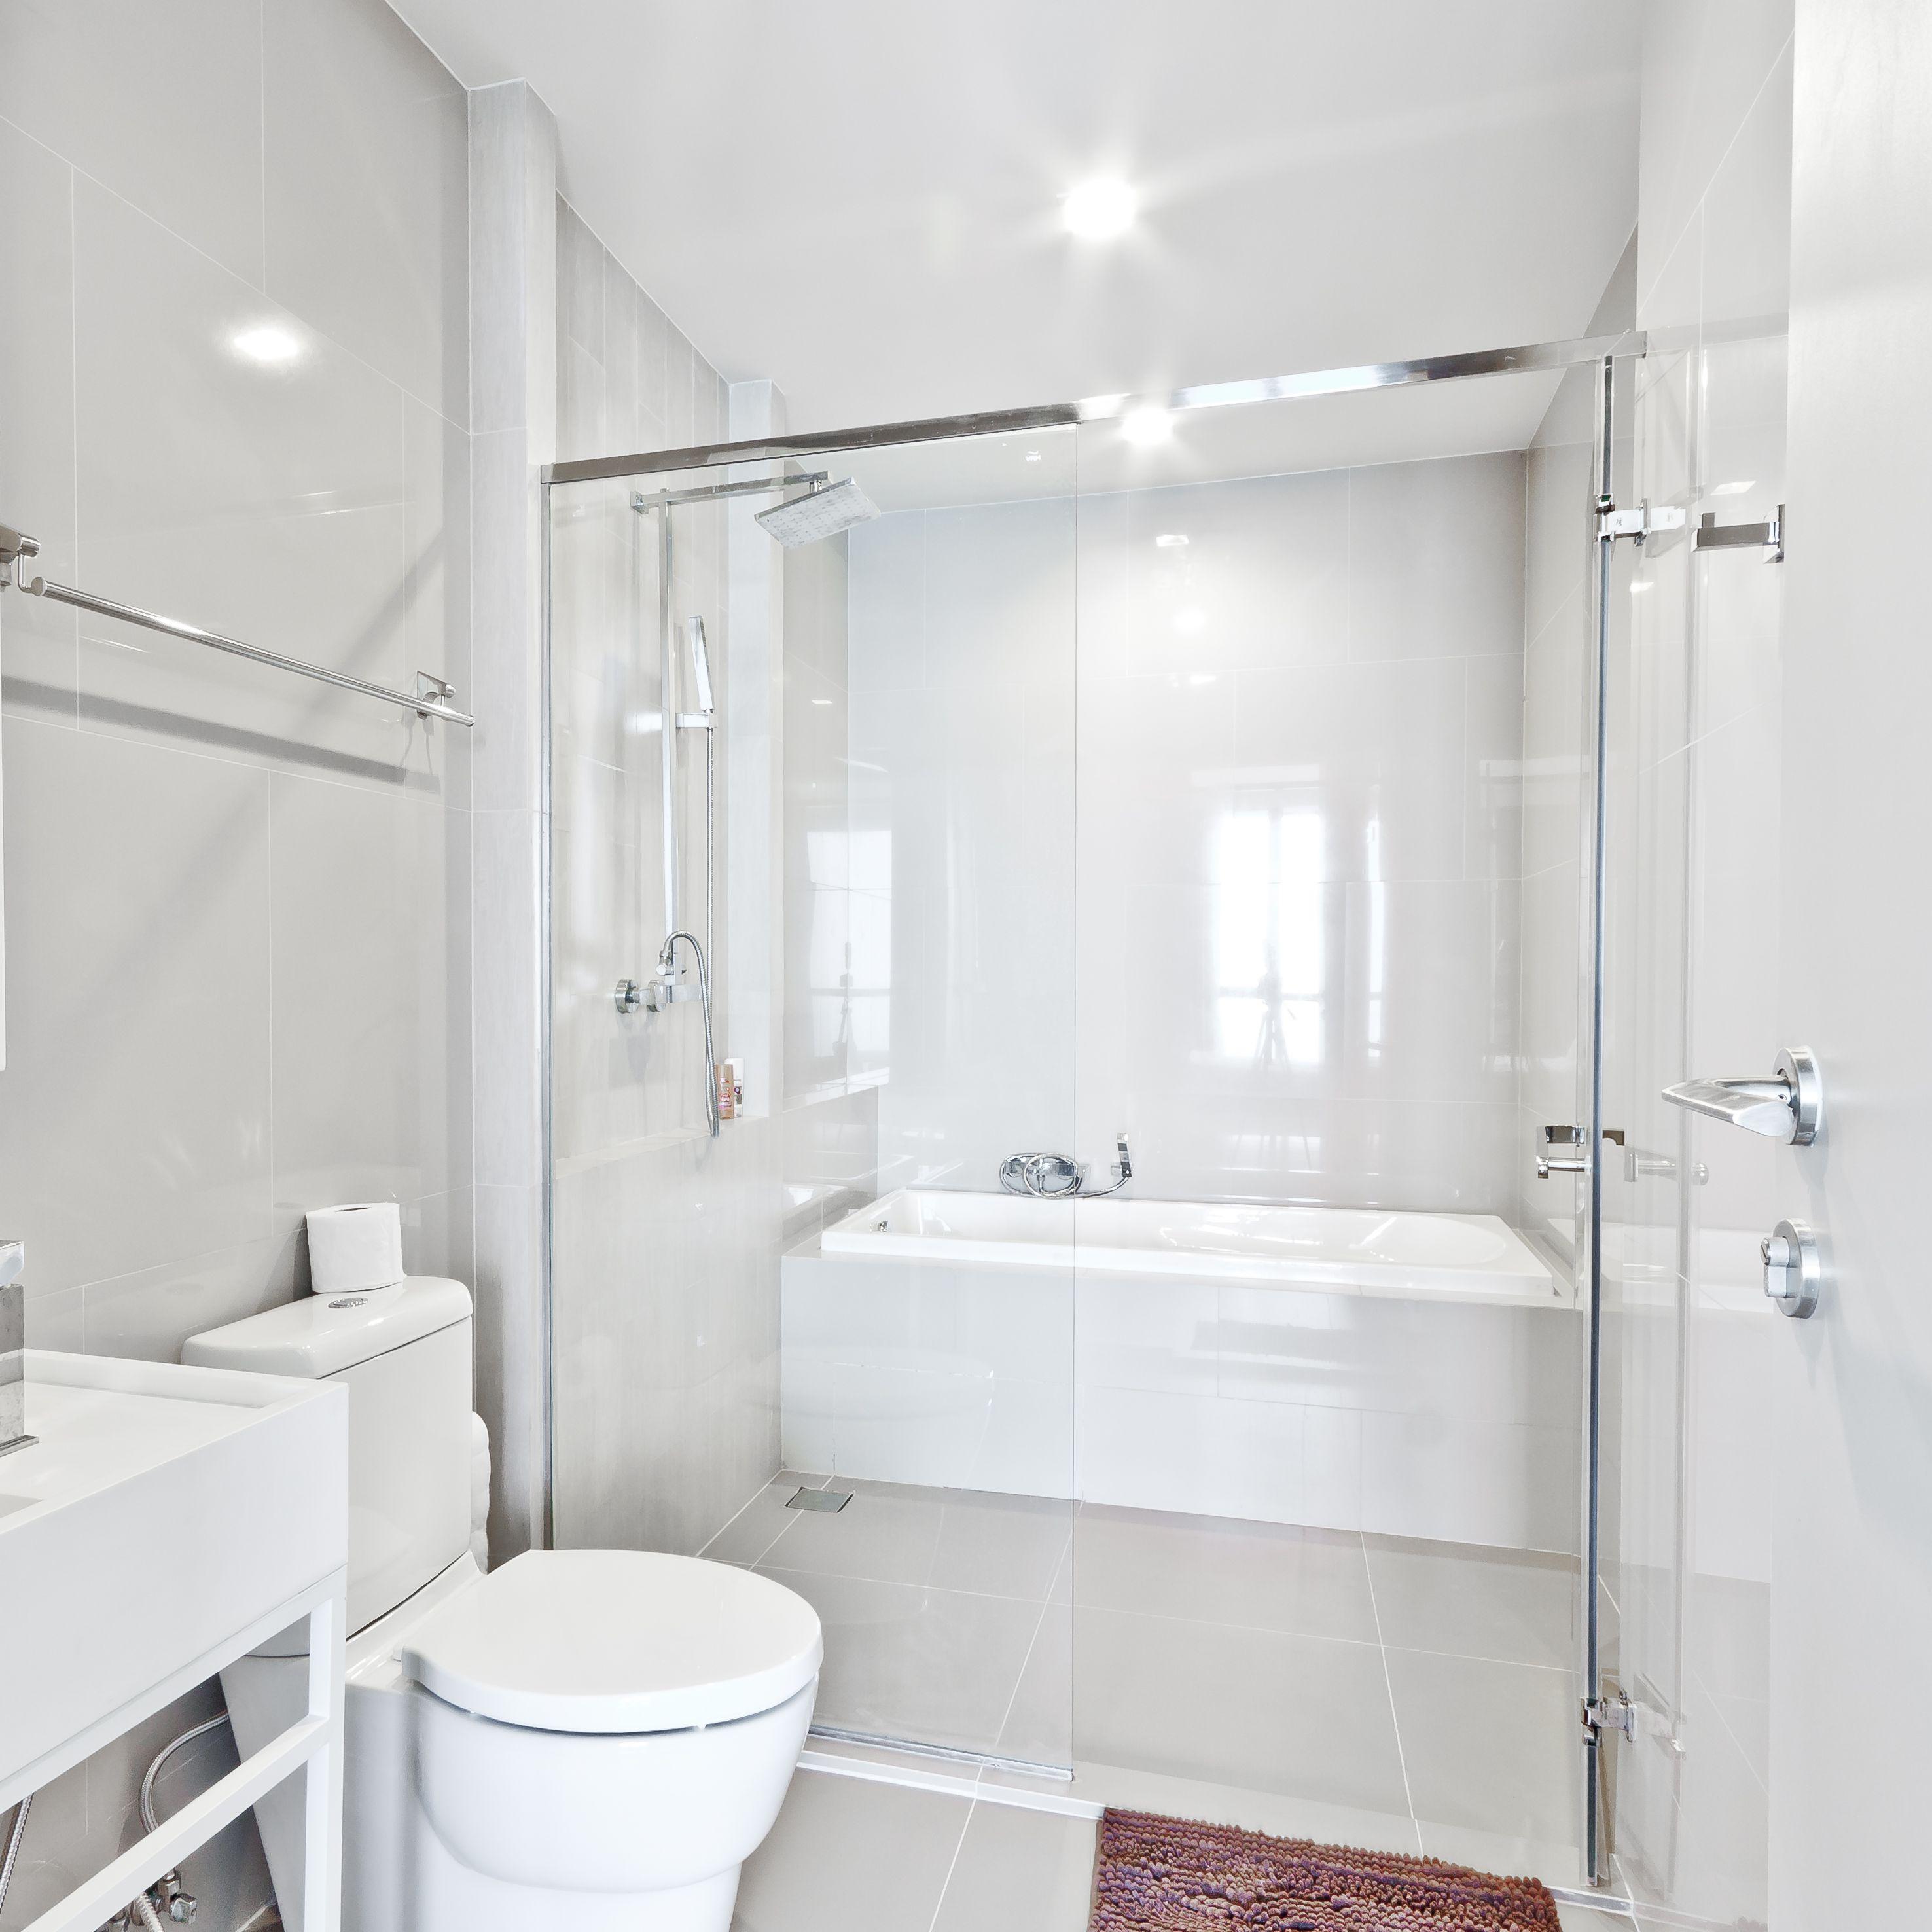 bathroom decoration ideas.htm 15 beautiful small bathroom designs  15 beautiful small bathroom designs